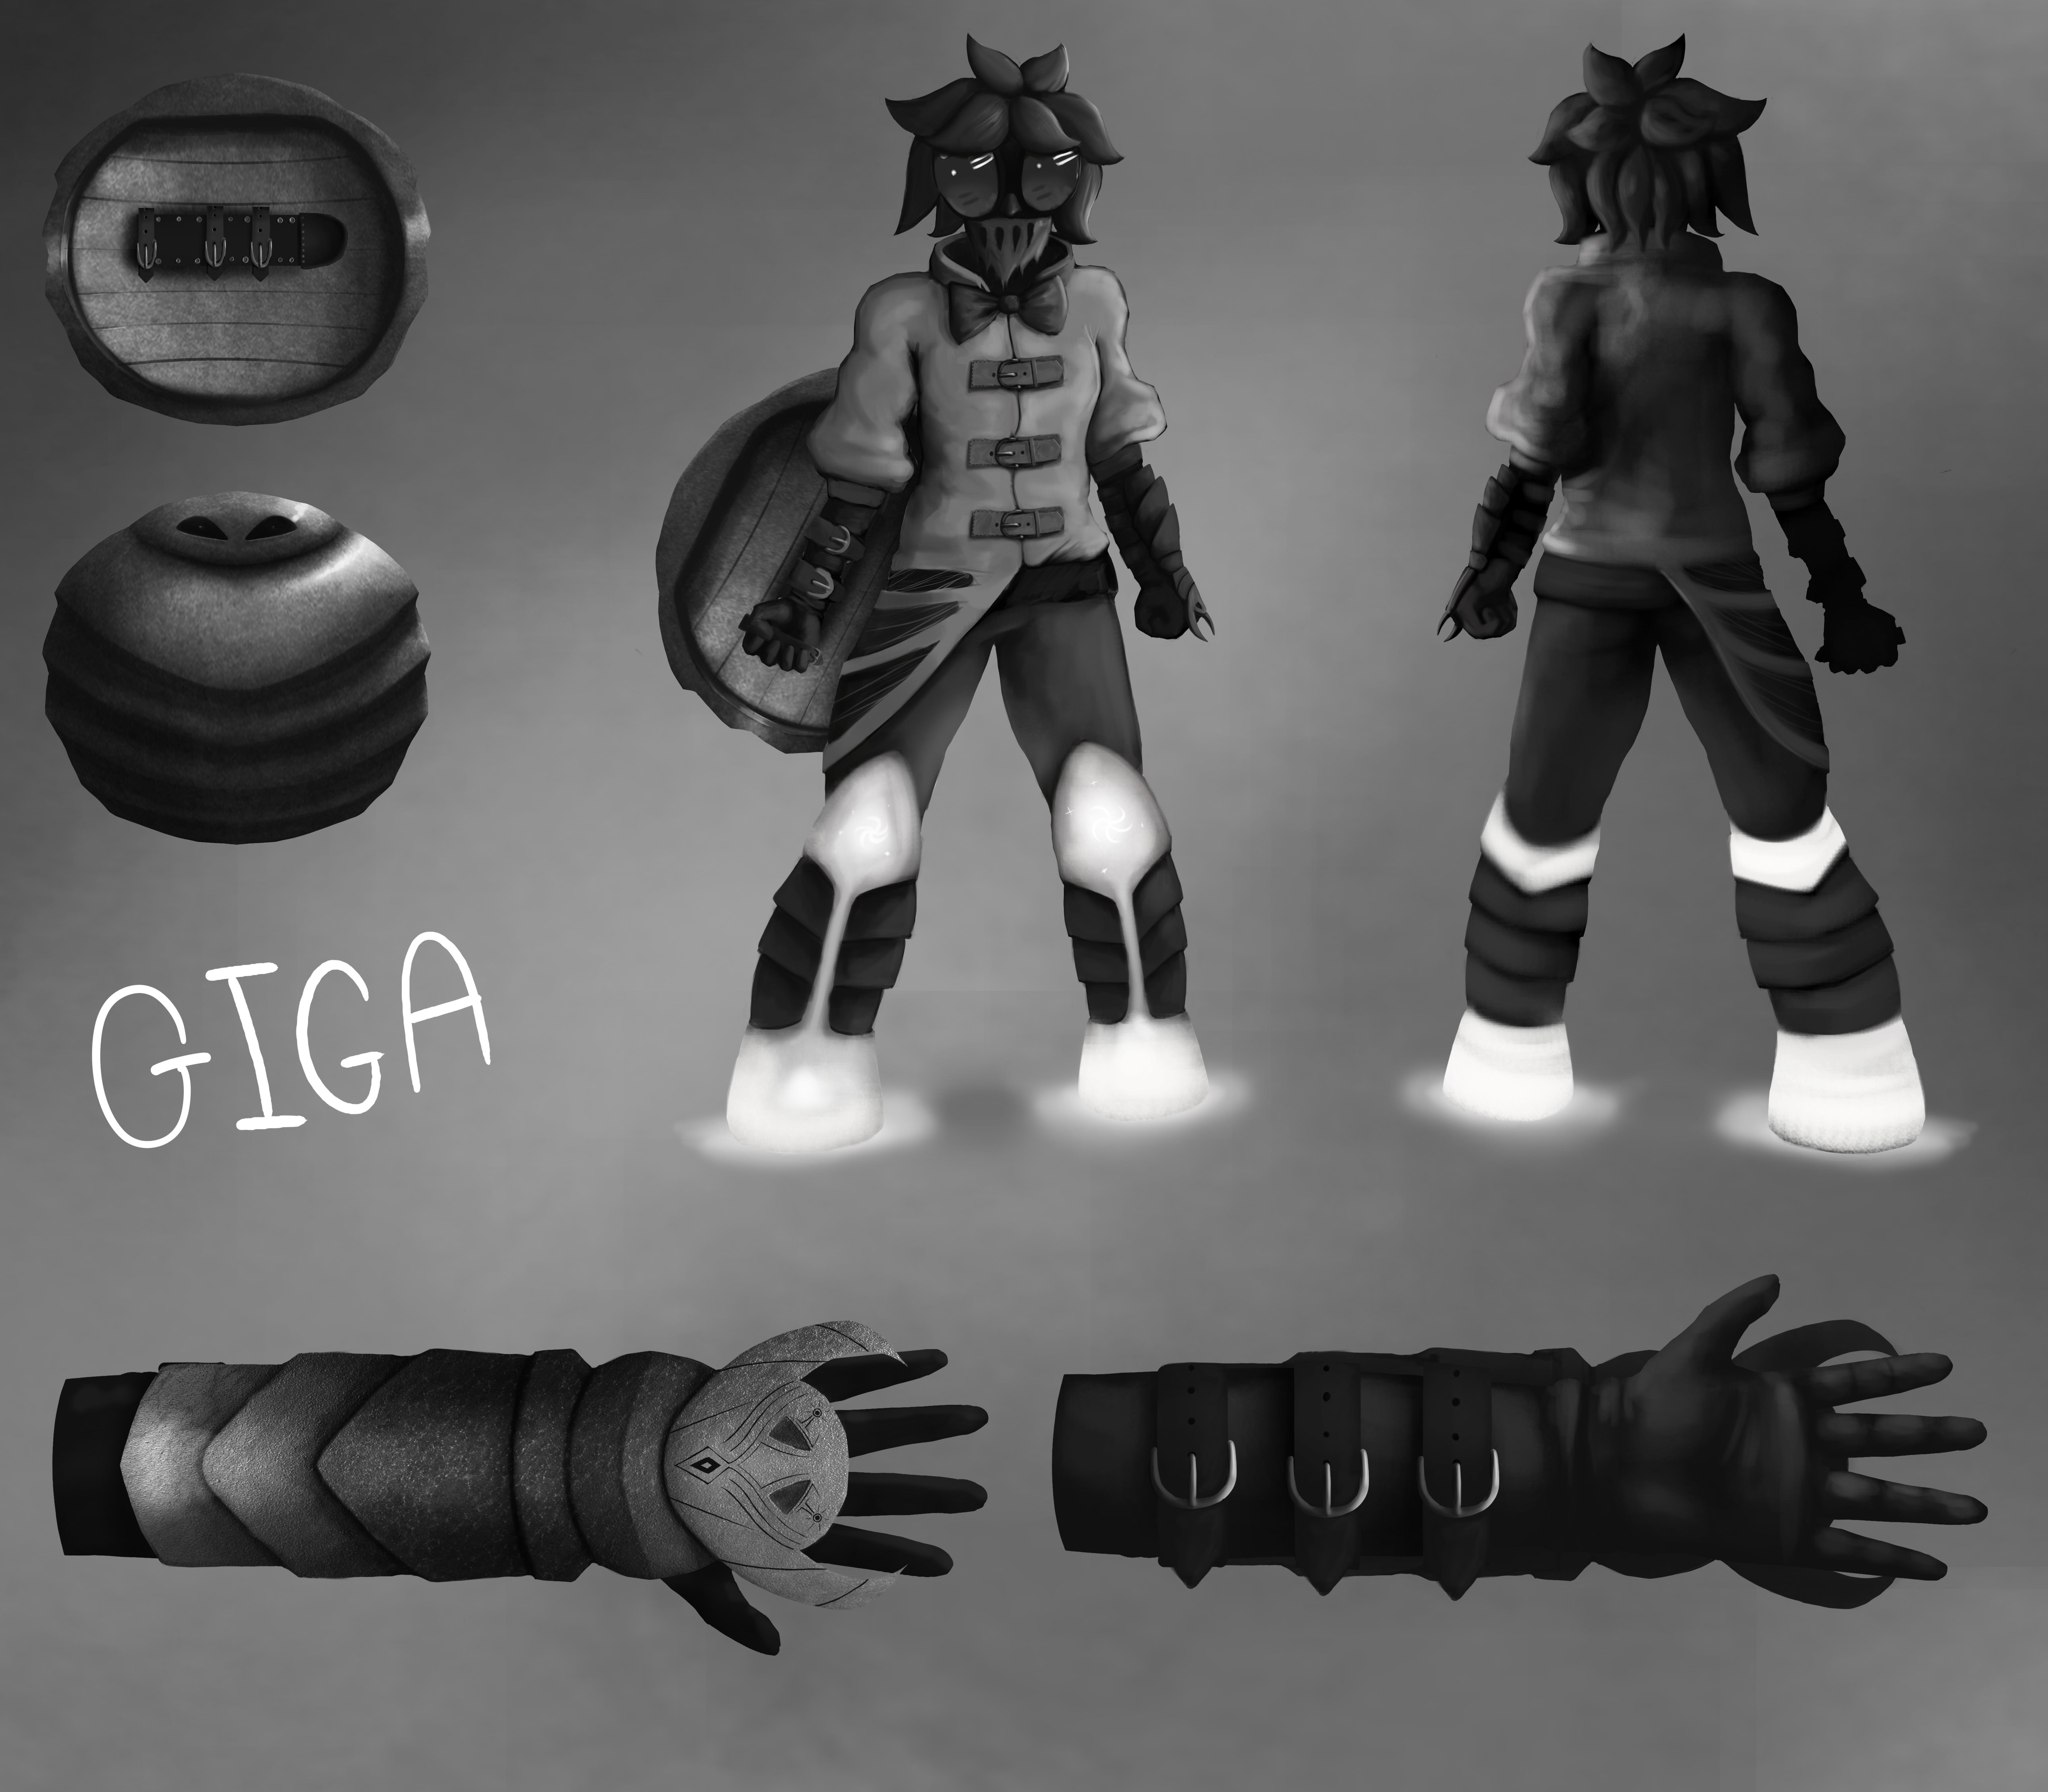 Giga Concept Art.